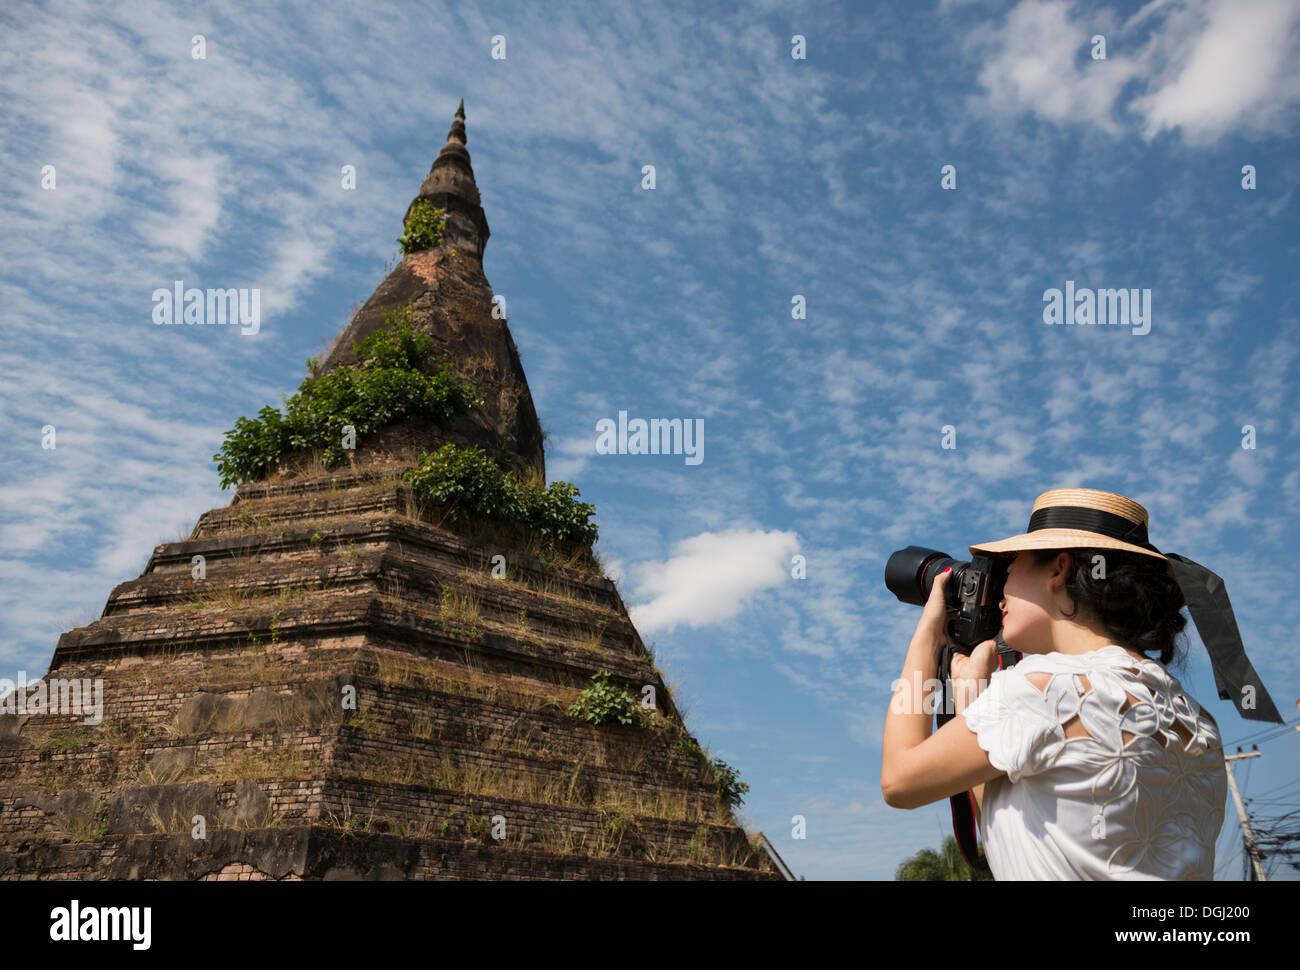 Woman taking photograph at That Dam, Vientiane, Laos - Stock Image